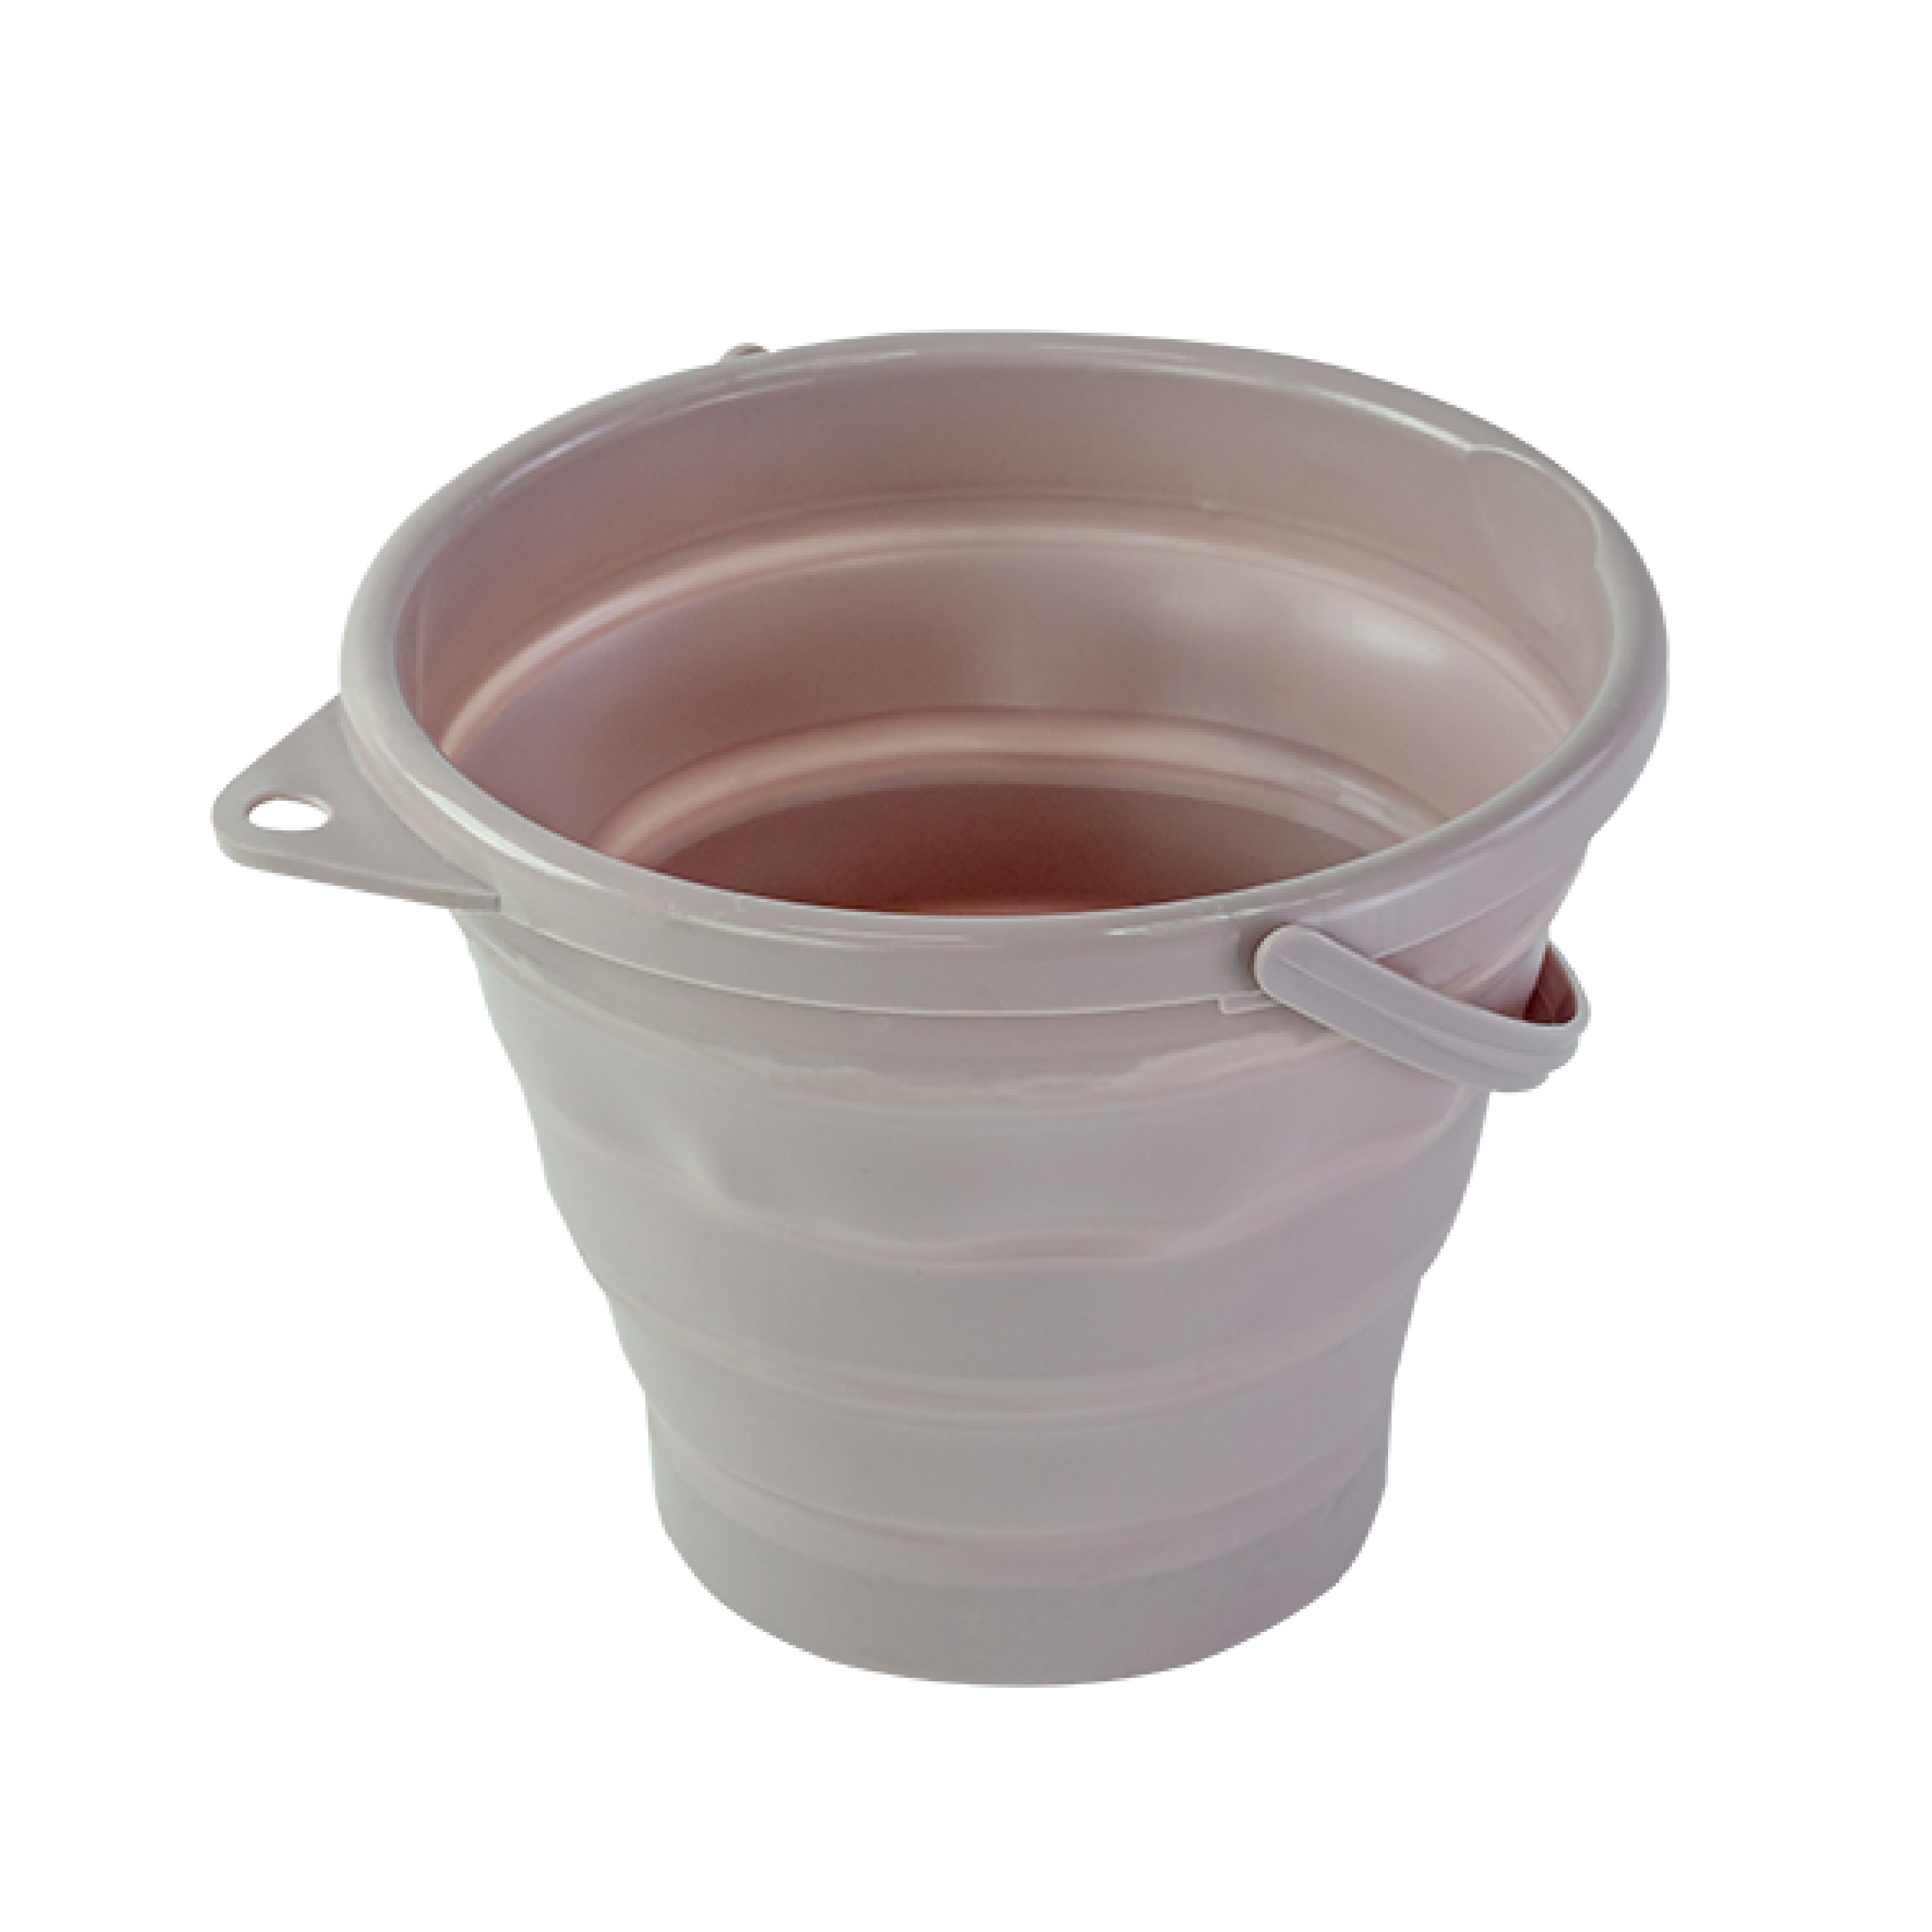 Bucket ถังน้ำพับเก็บได้ ความจุ 10L 33x36x5cm สีม่วง ST210324-10